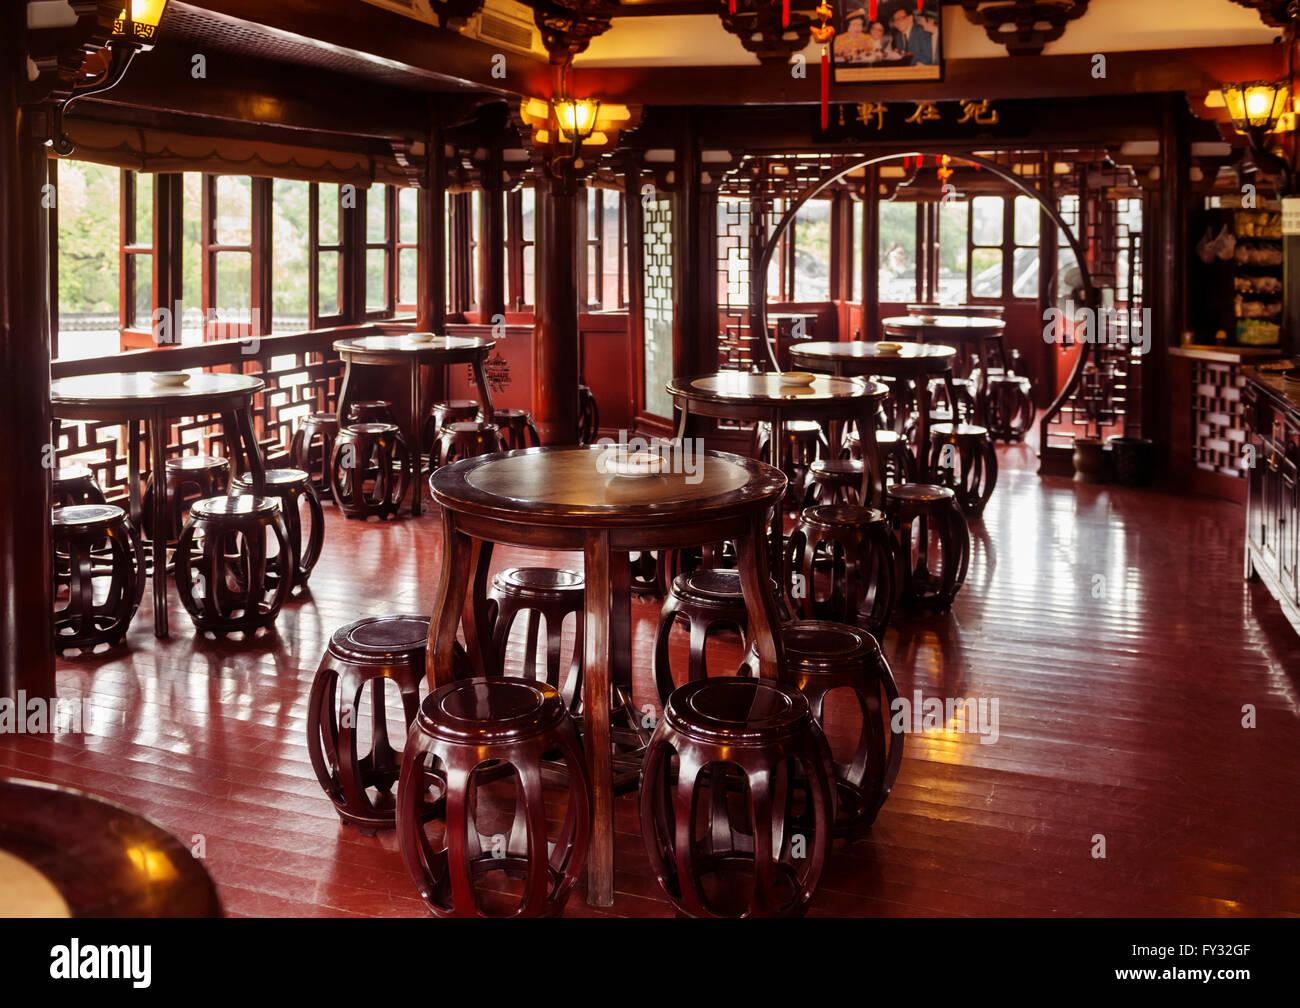 Traditional tea house interior, Shanghai, China - Stock Image